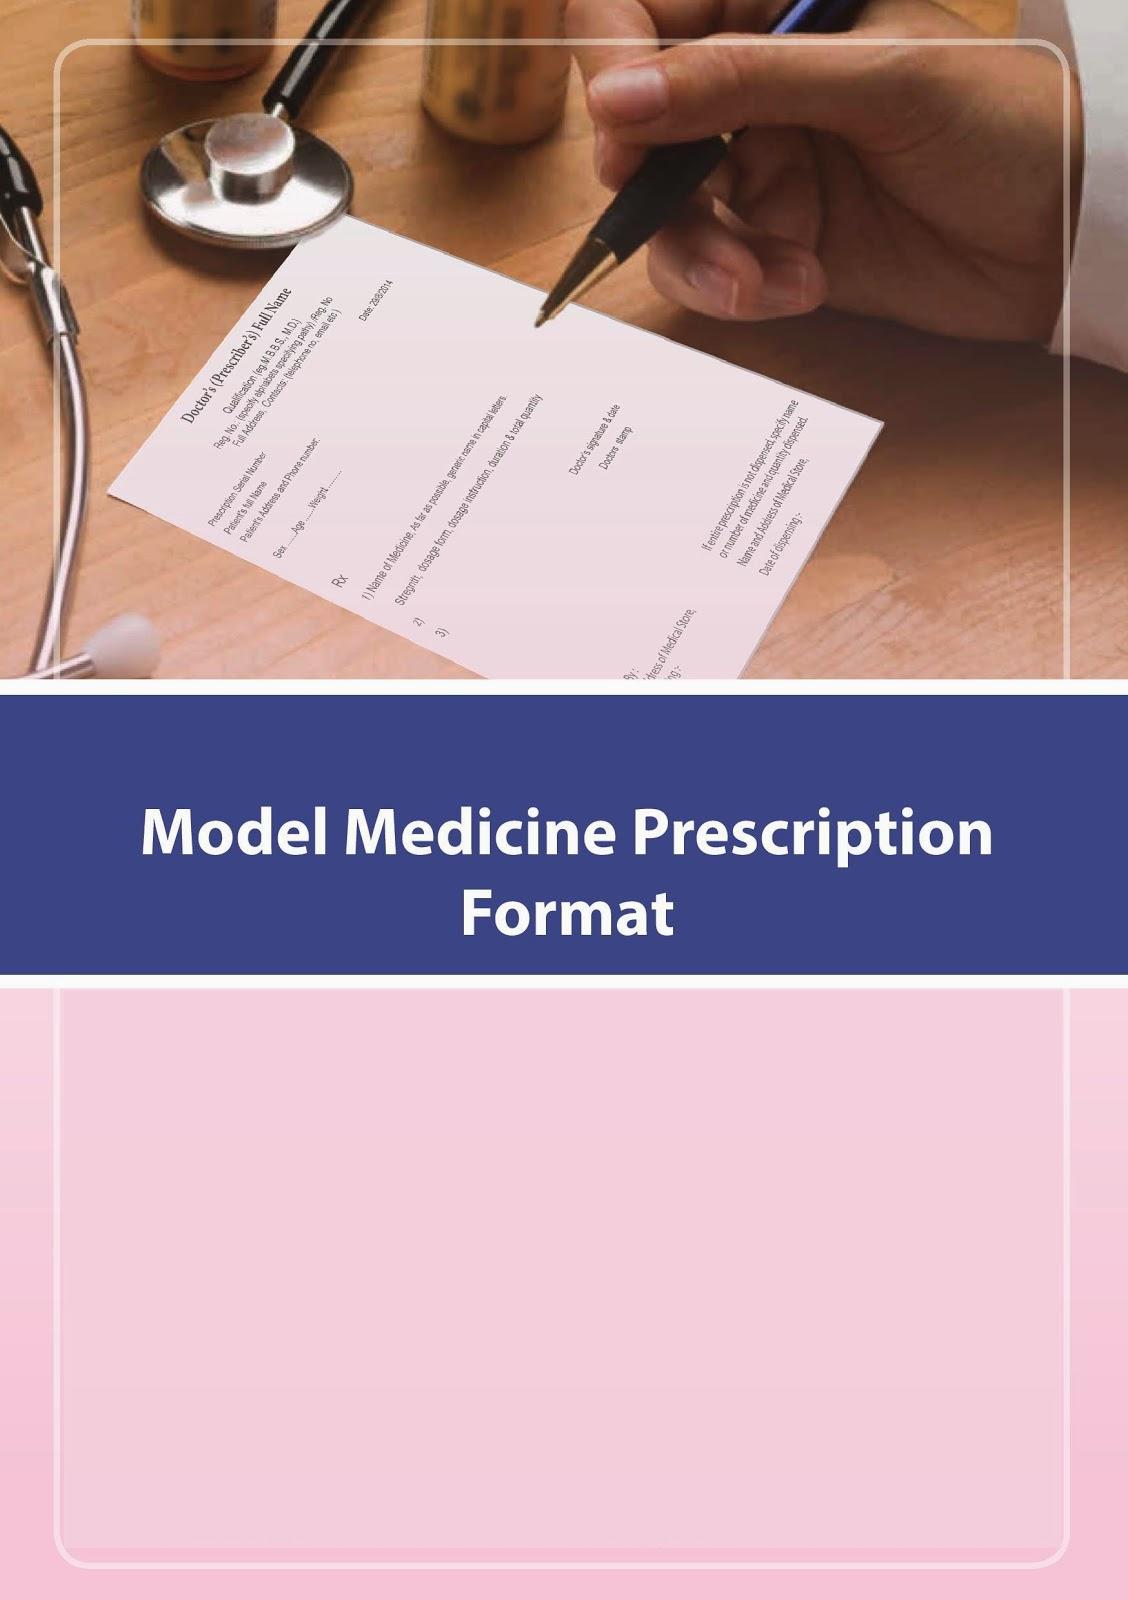 Model Medicine Prescription Format